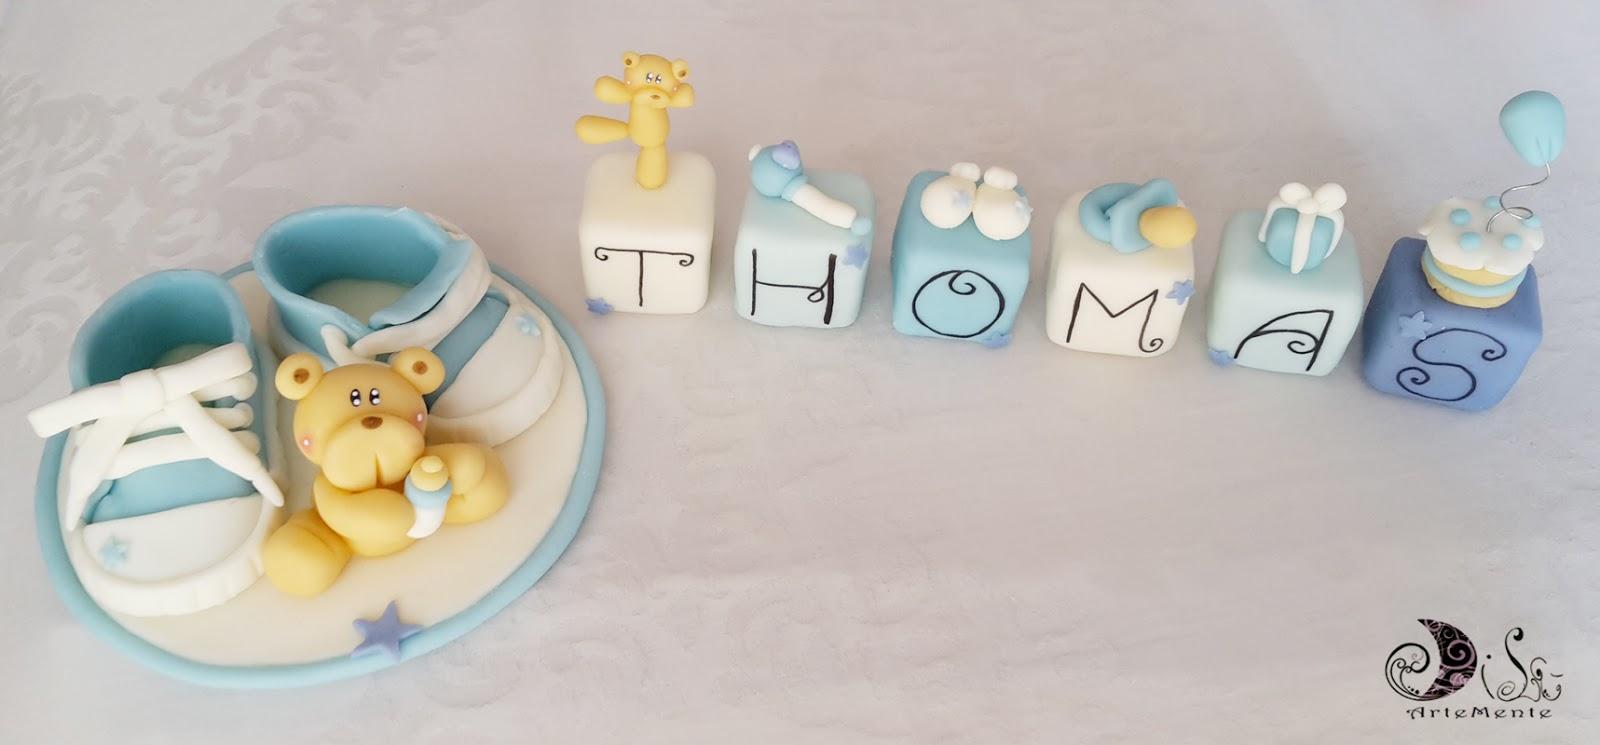 Thomas Cake Topper Nz